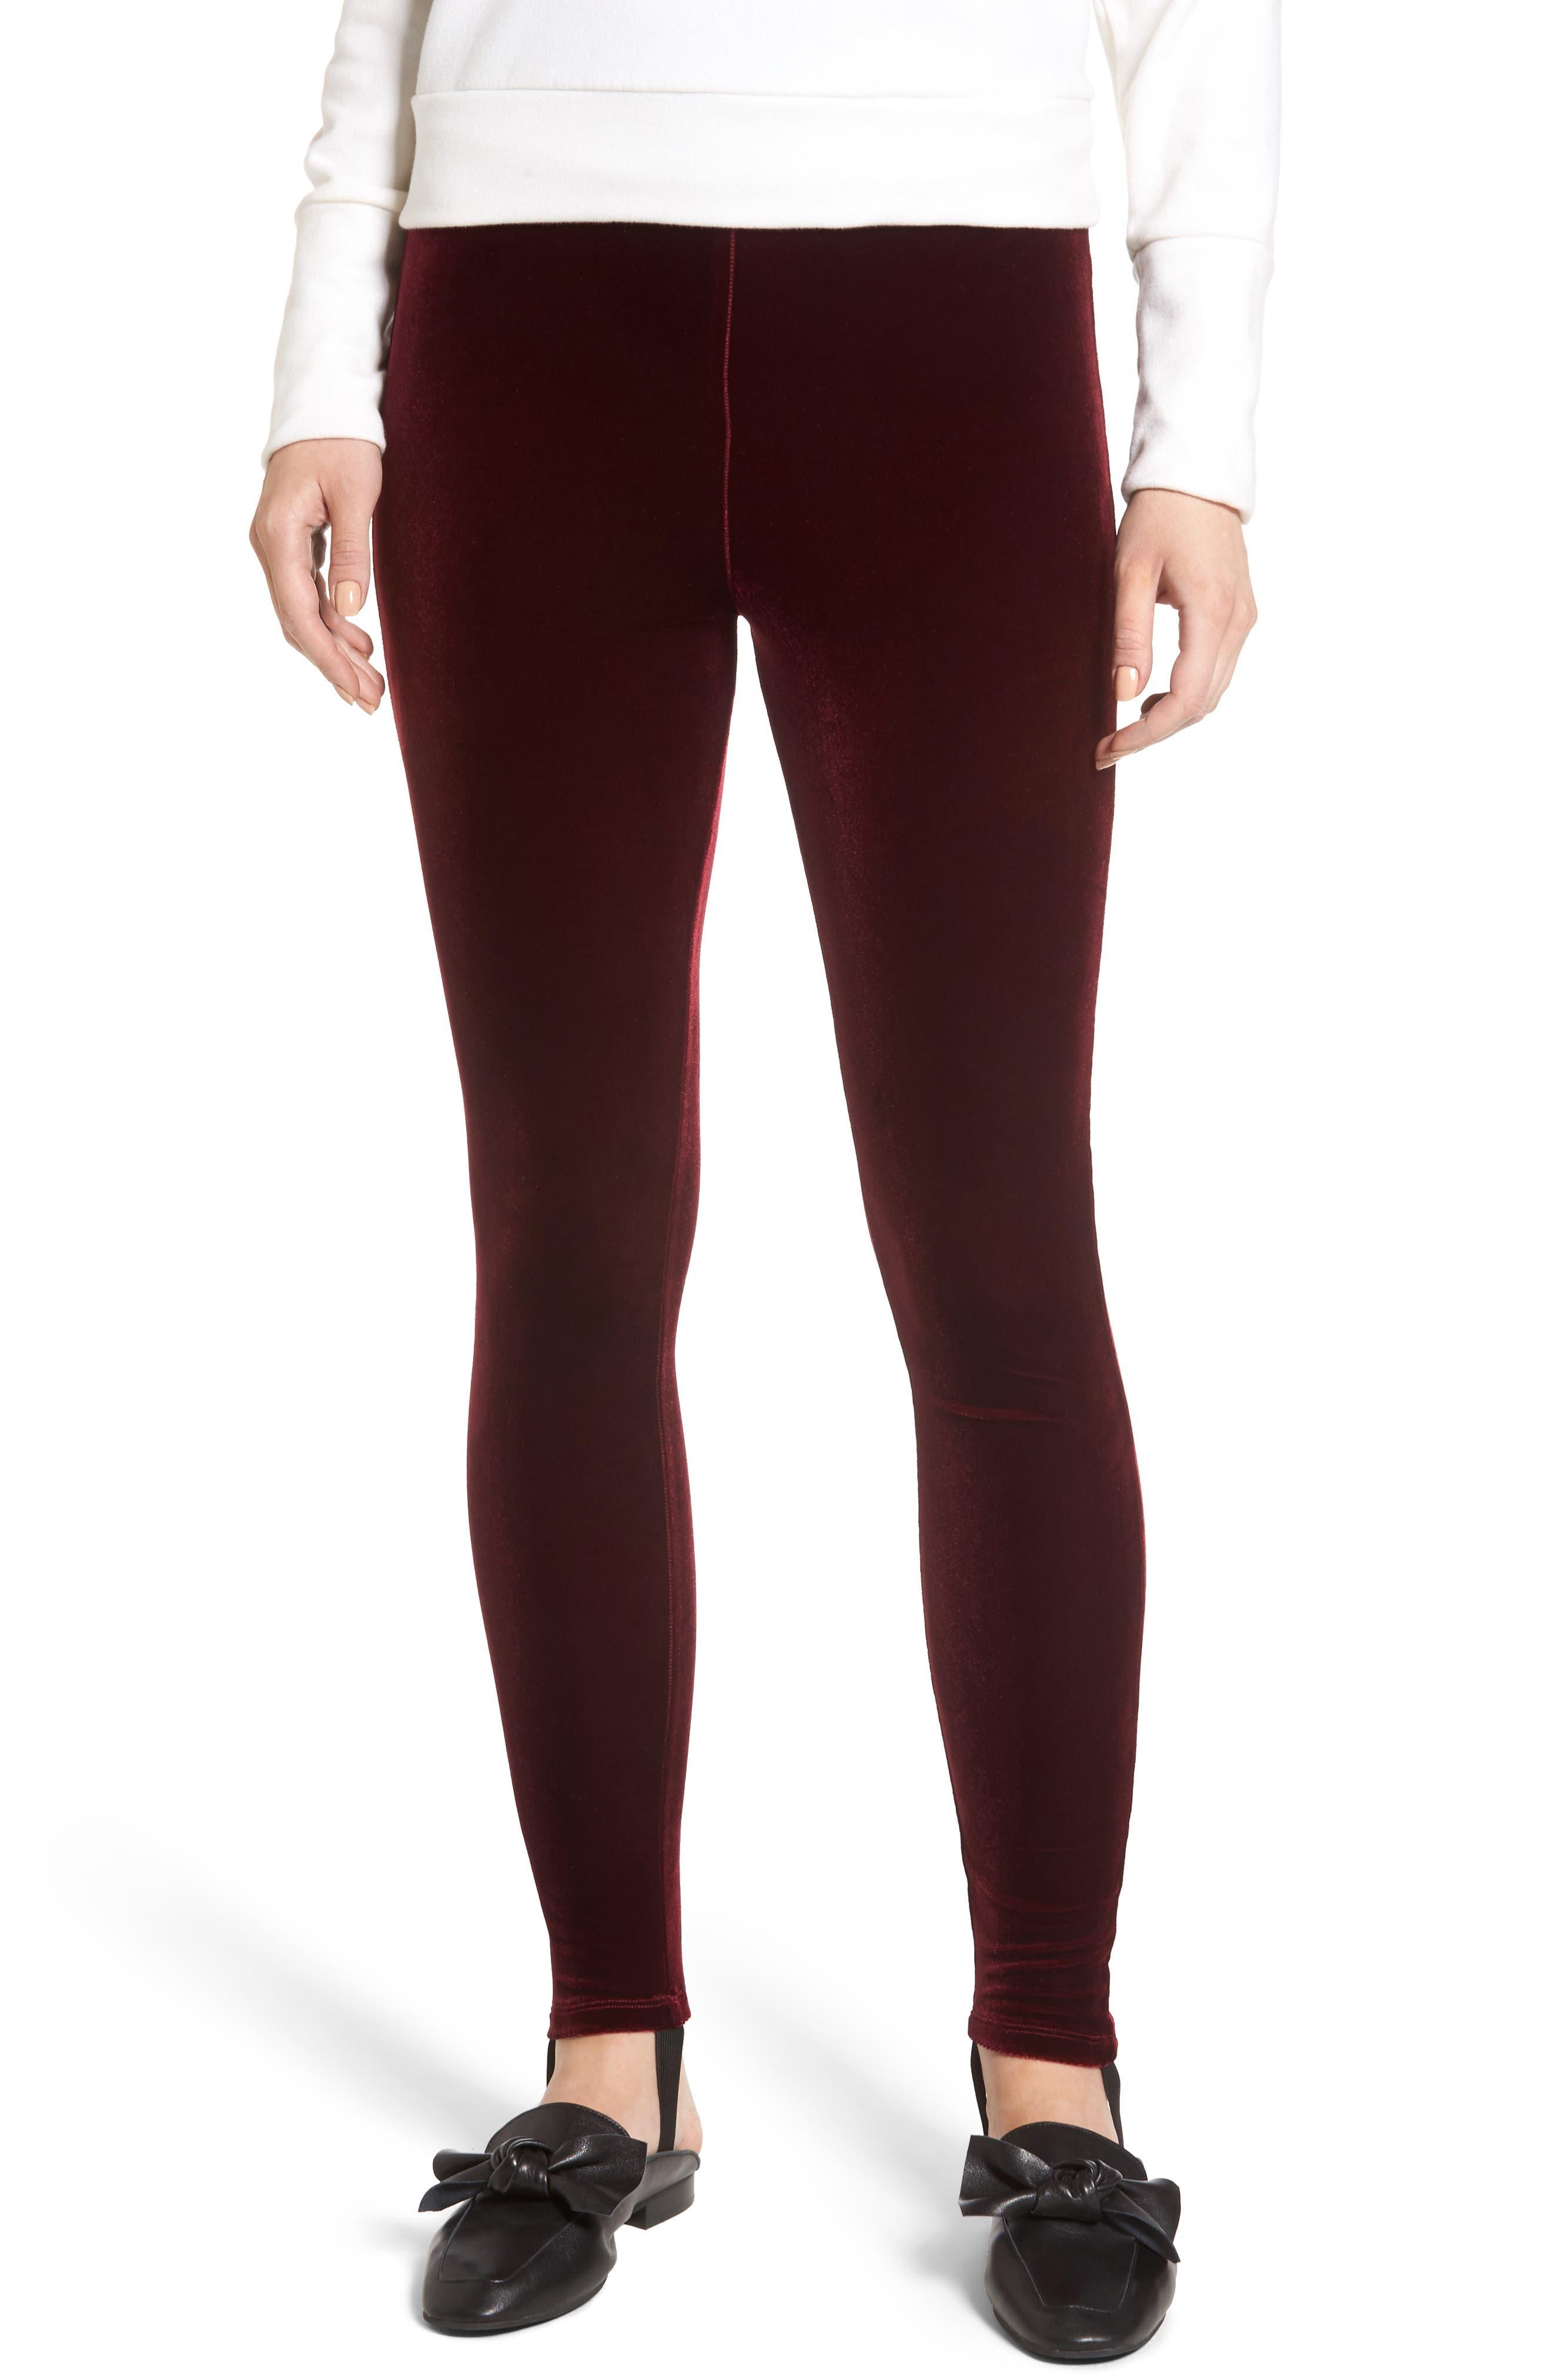 Alternate Image 1 Selected - Leith High Waist Velour Stirrup Pants